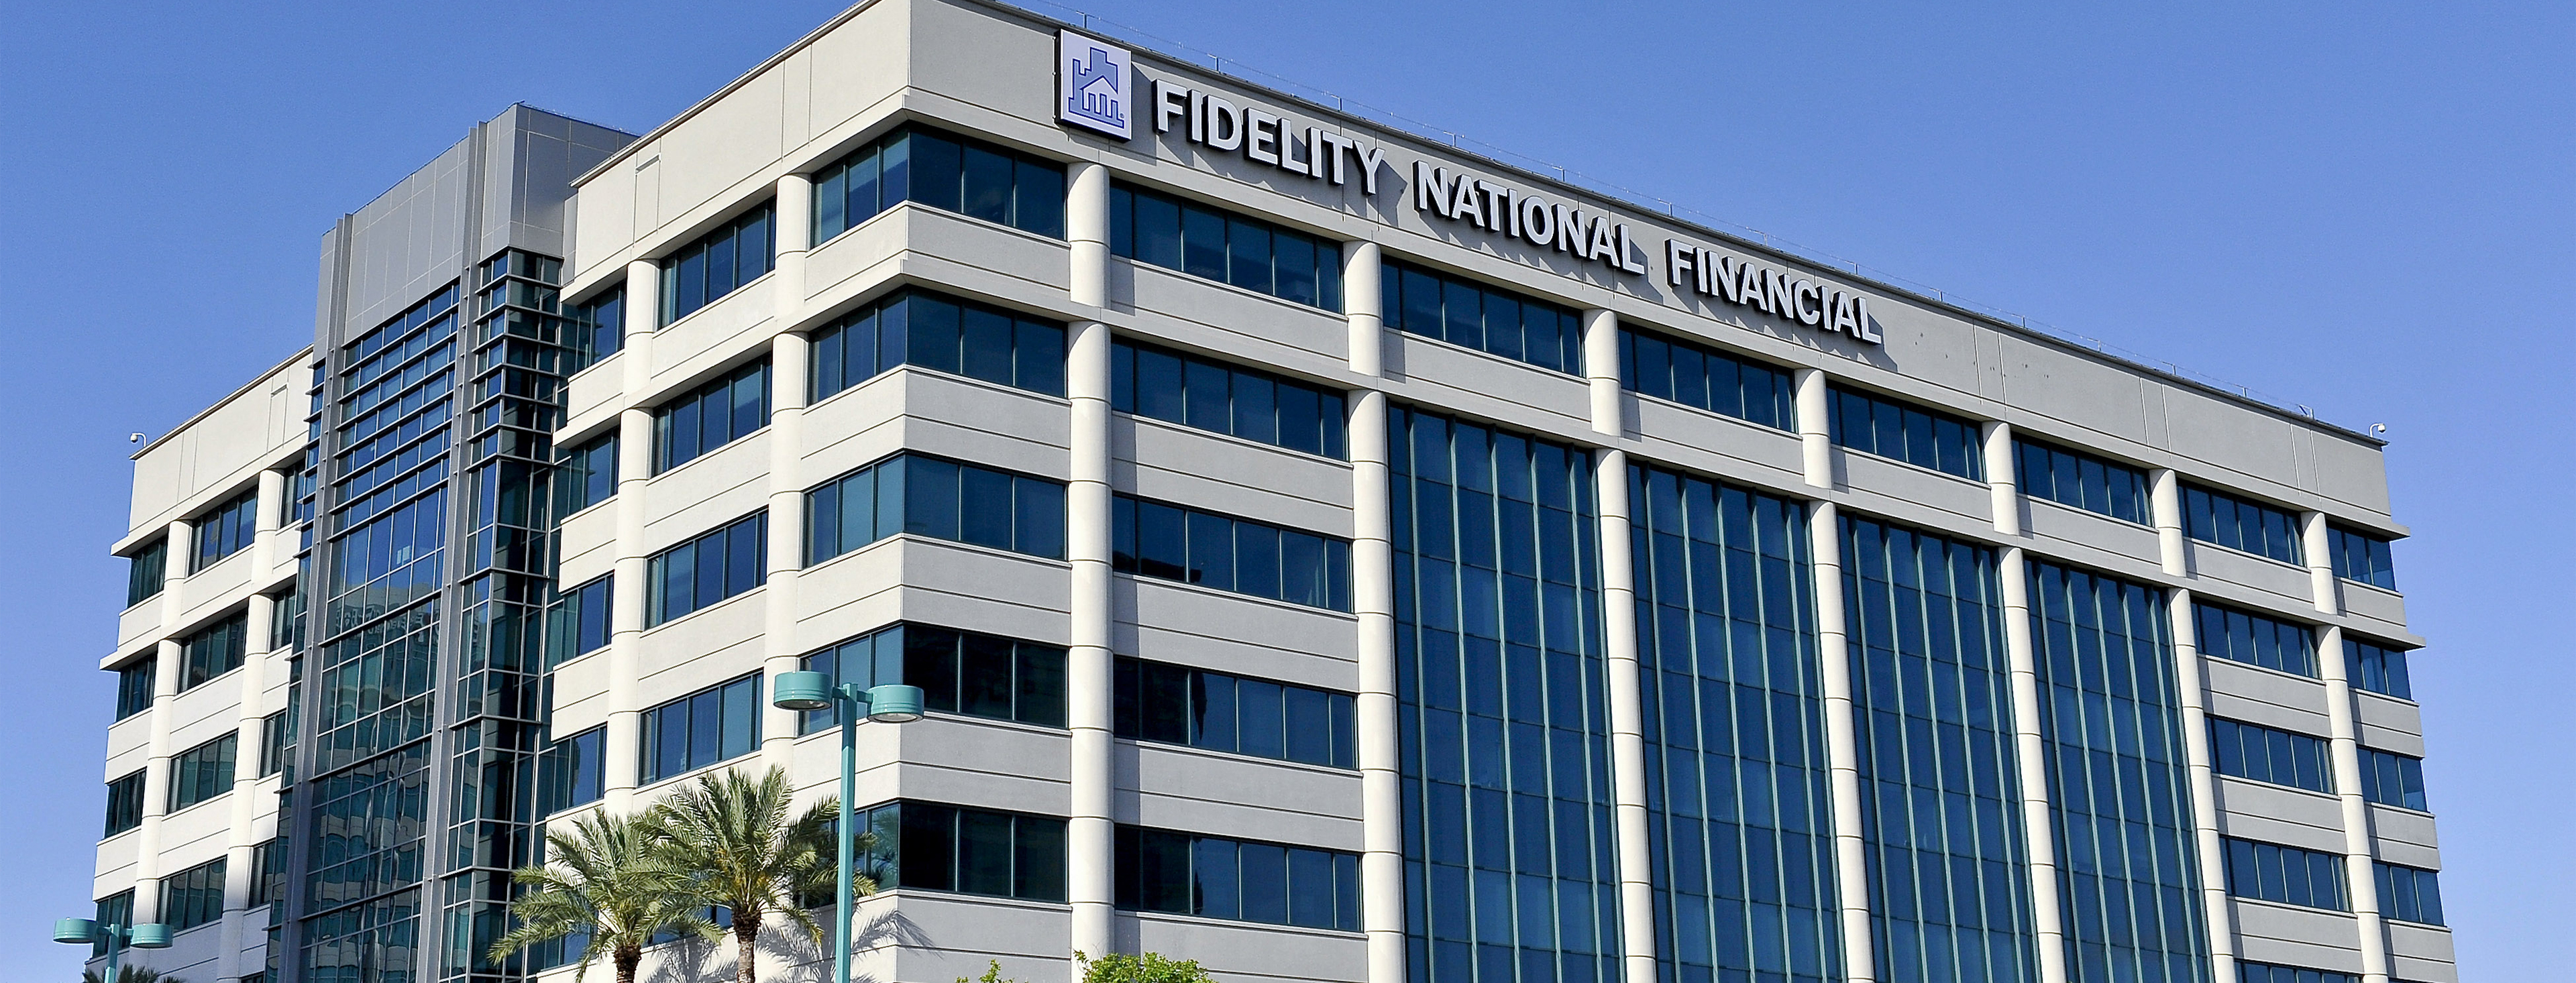 Blackstone-Led Fidelity Information Bid May Exceed $15 Billion